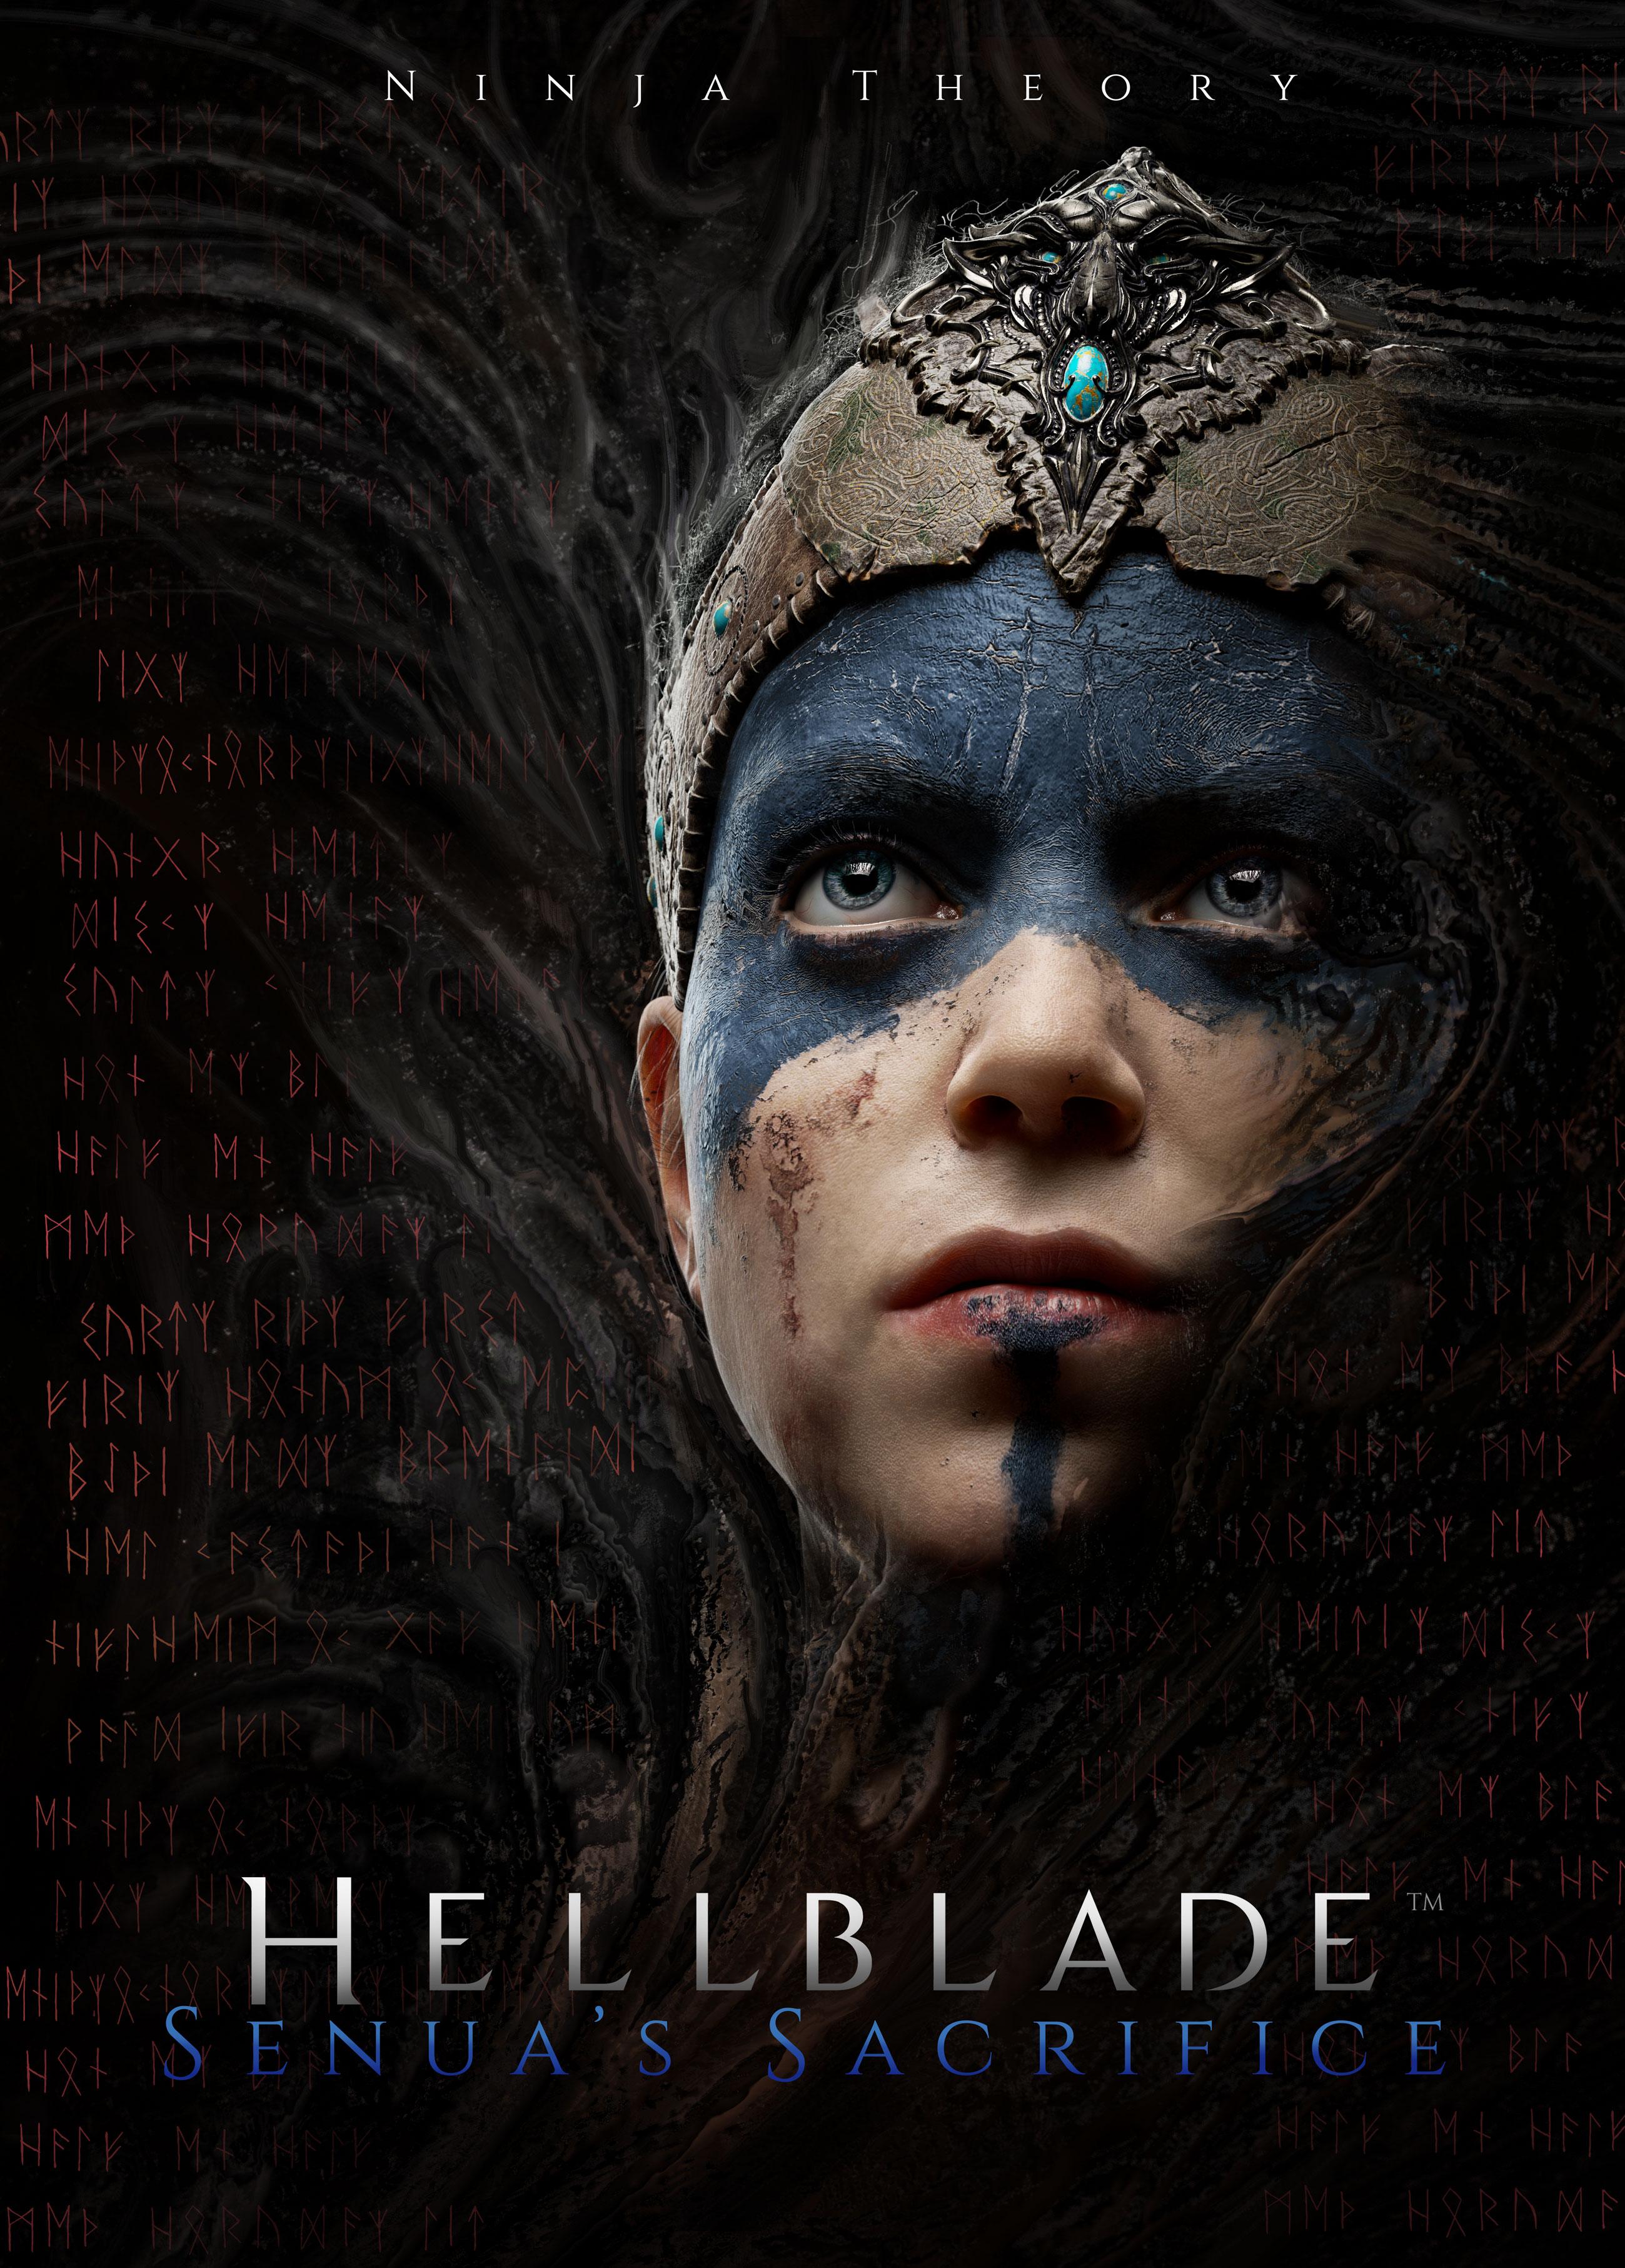 Hellblade-Senuas-Sacrifice-poster